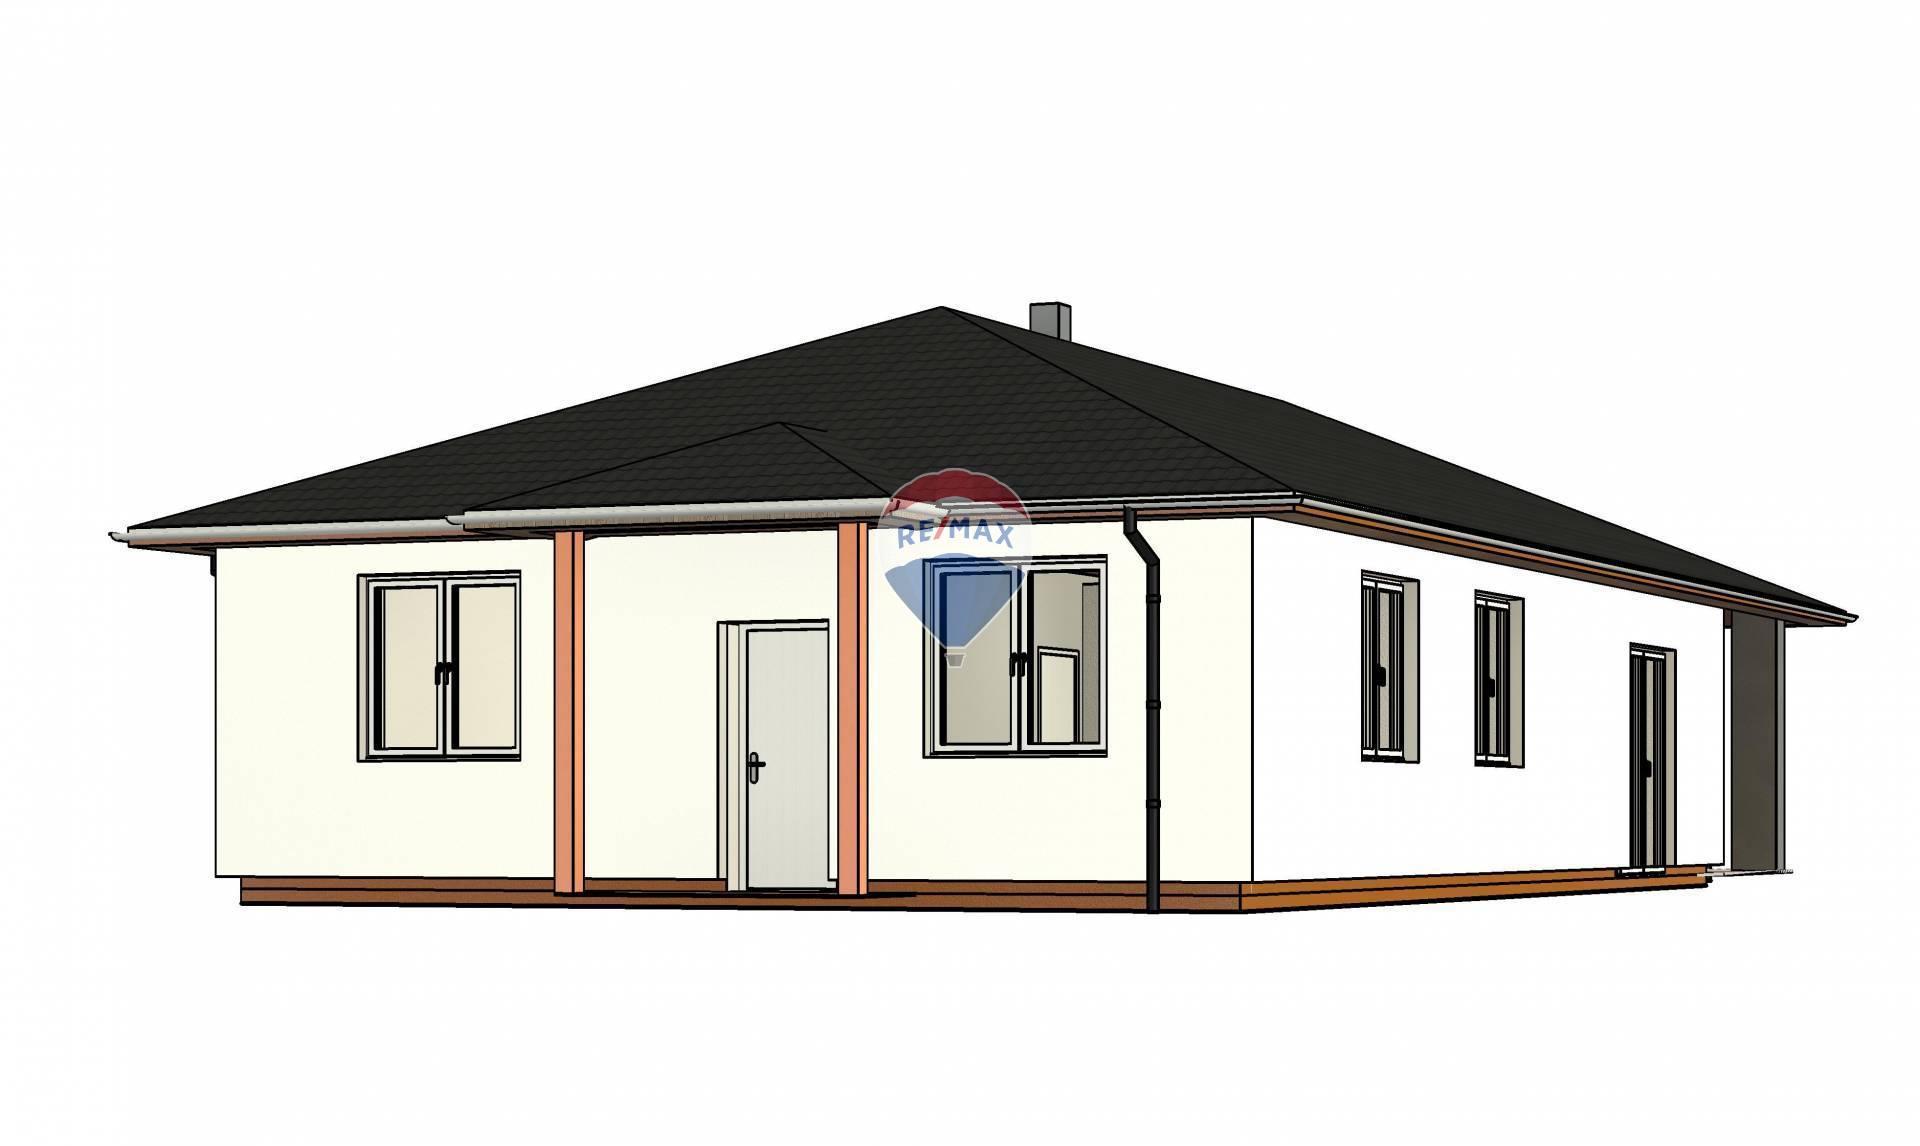 Novostavba 4 izbový rodinný dom - holodom Košice okolie  ZNÍŹENÁ CENA !!!!